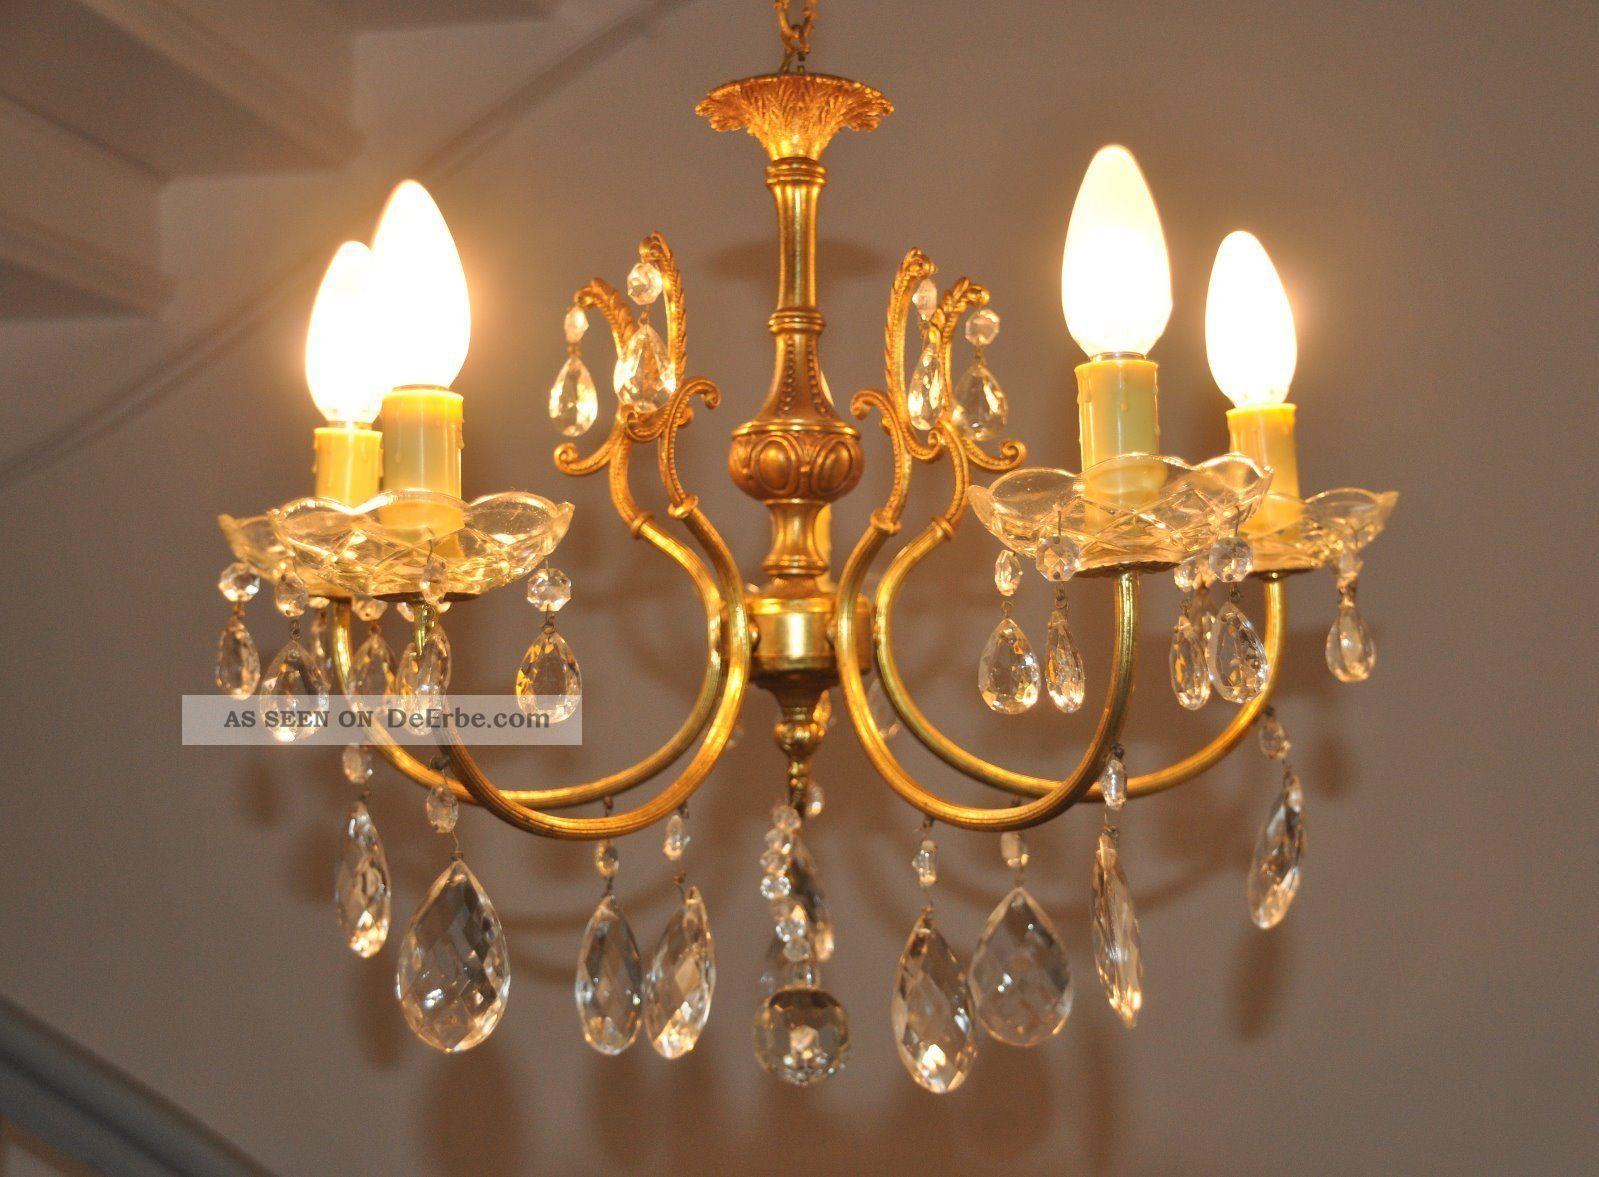 Antik Kronleuchter Lüster Kristall Lampe ~ Antiker jugendstil kristall kronleuchter lüster lampe 5 flam.